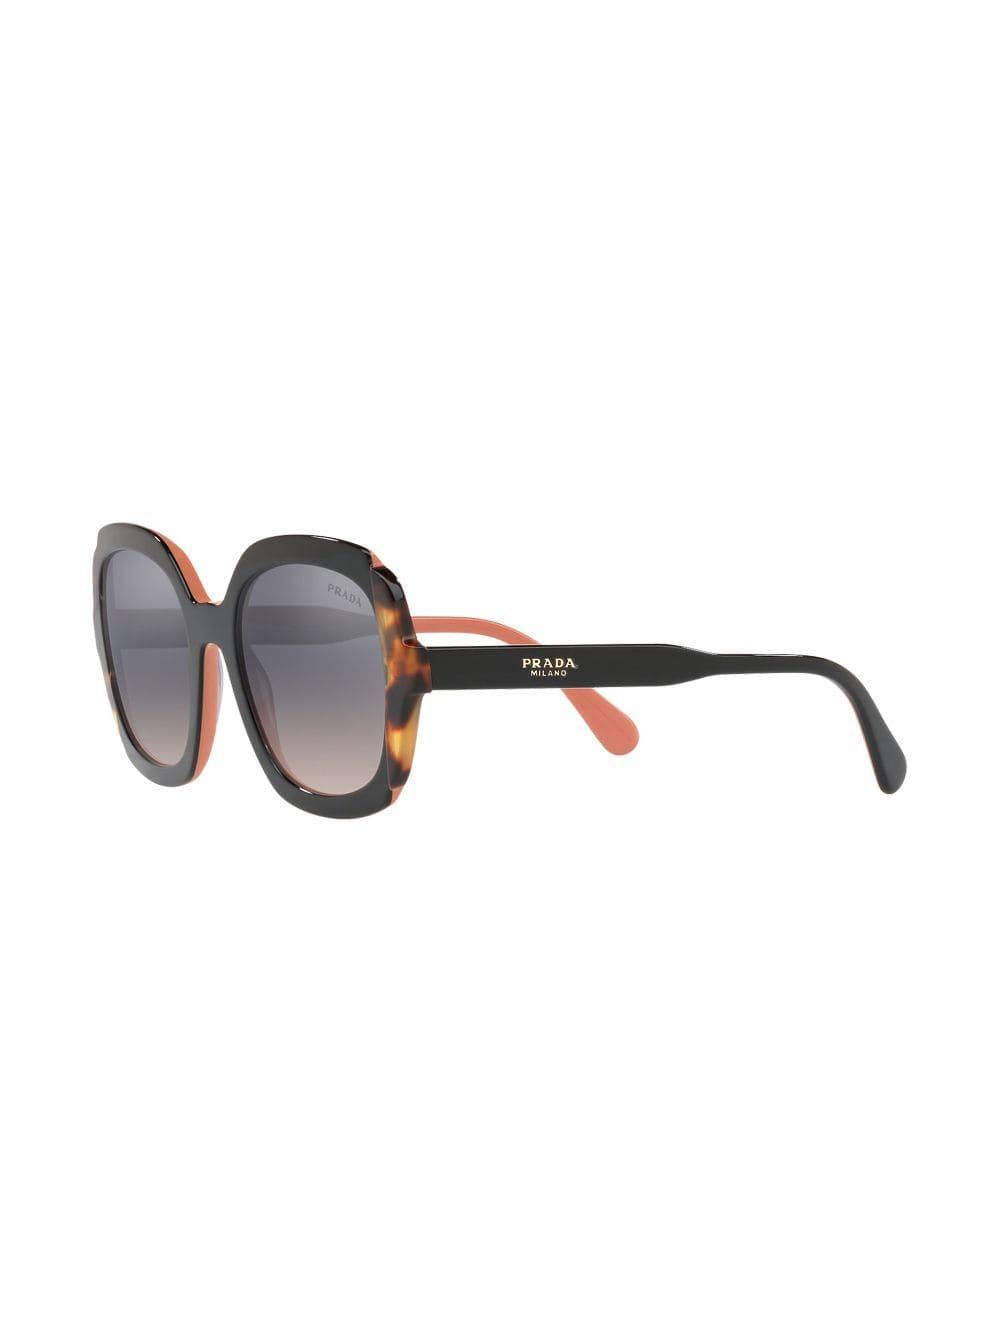 5aeee329f760 Prada Tortoiseshell Detail Sunglasses in Black - Lyst